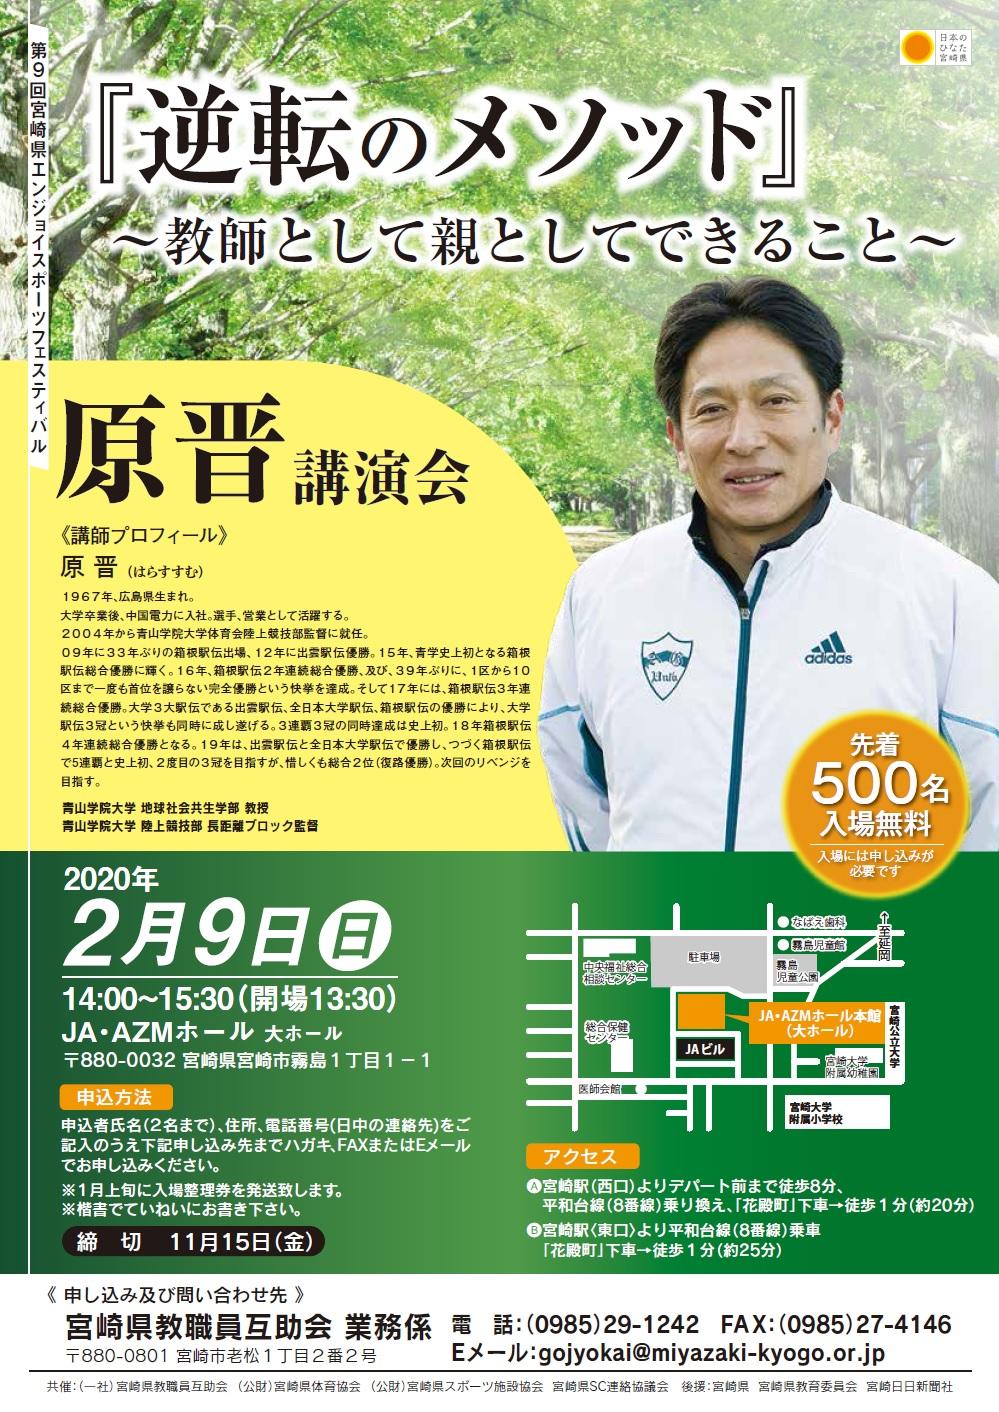 http://www.miyazaki-kyogo.or.jp/publiculture/sport/hara%202019.jpg